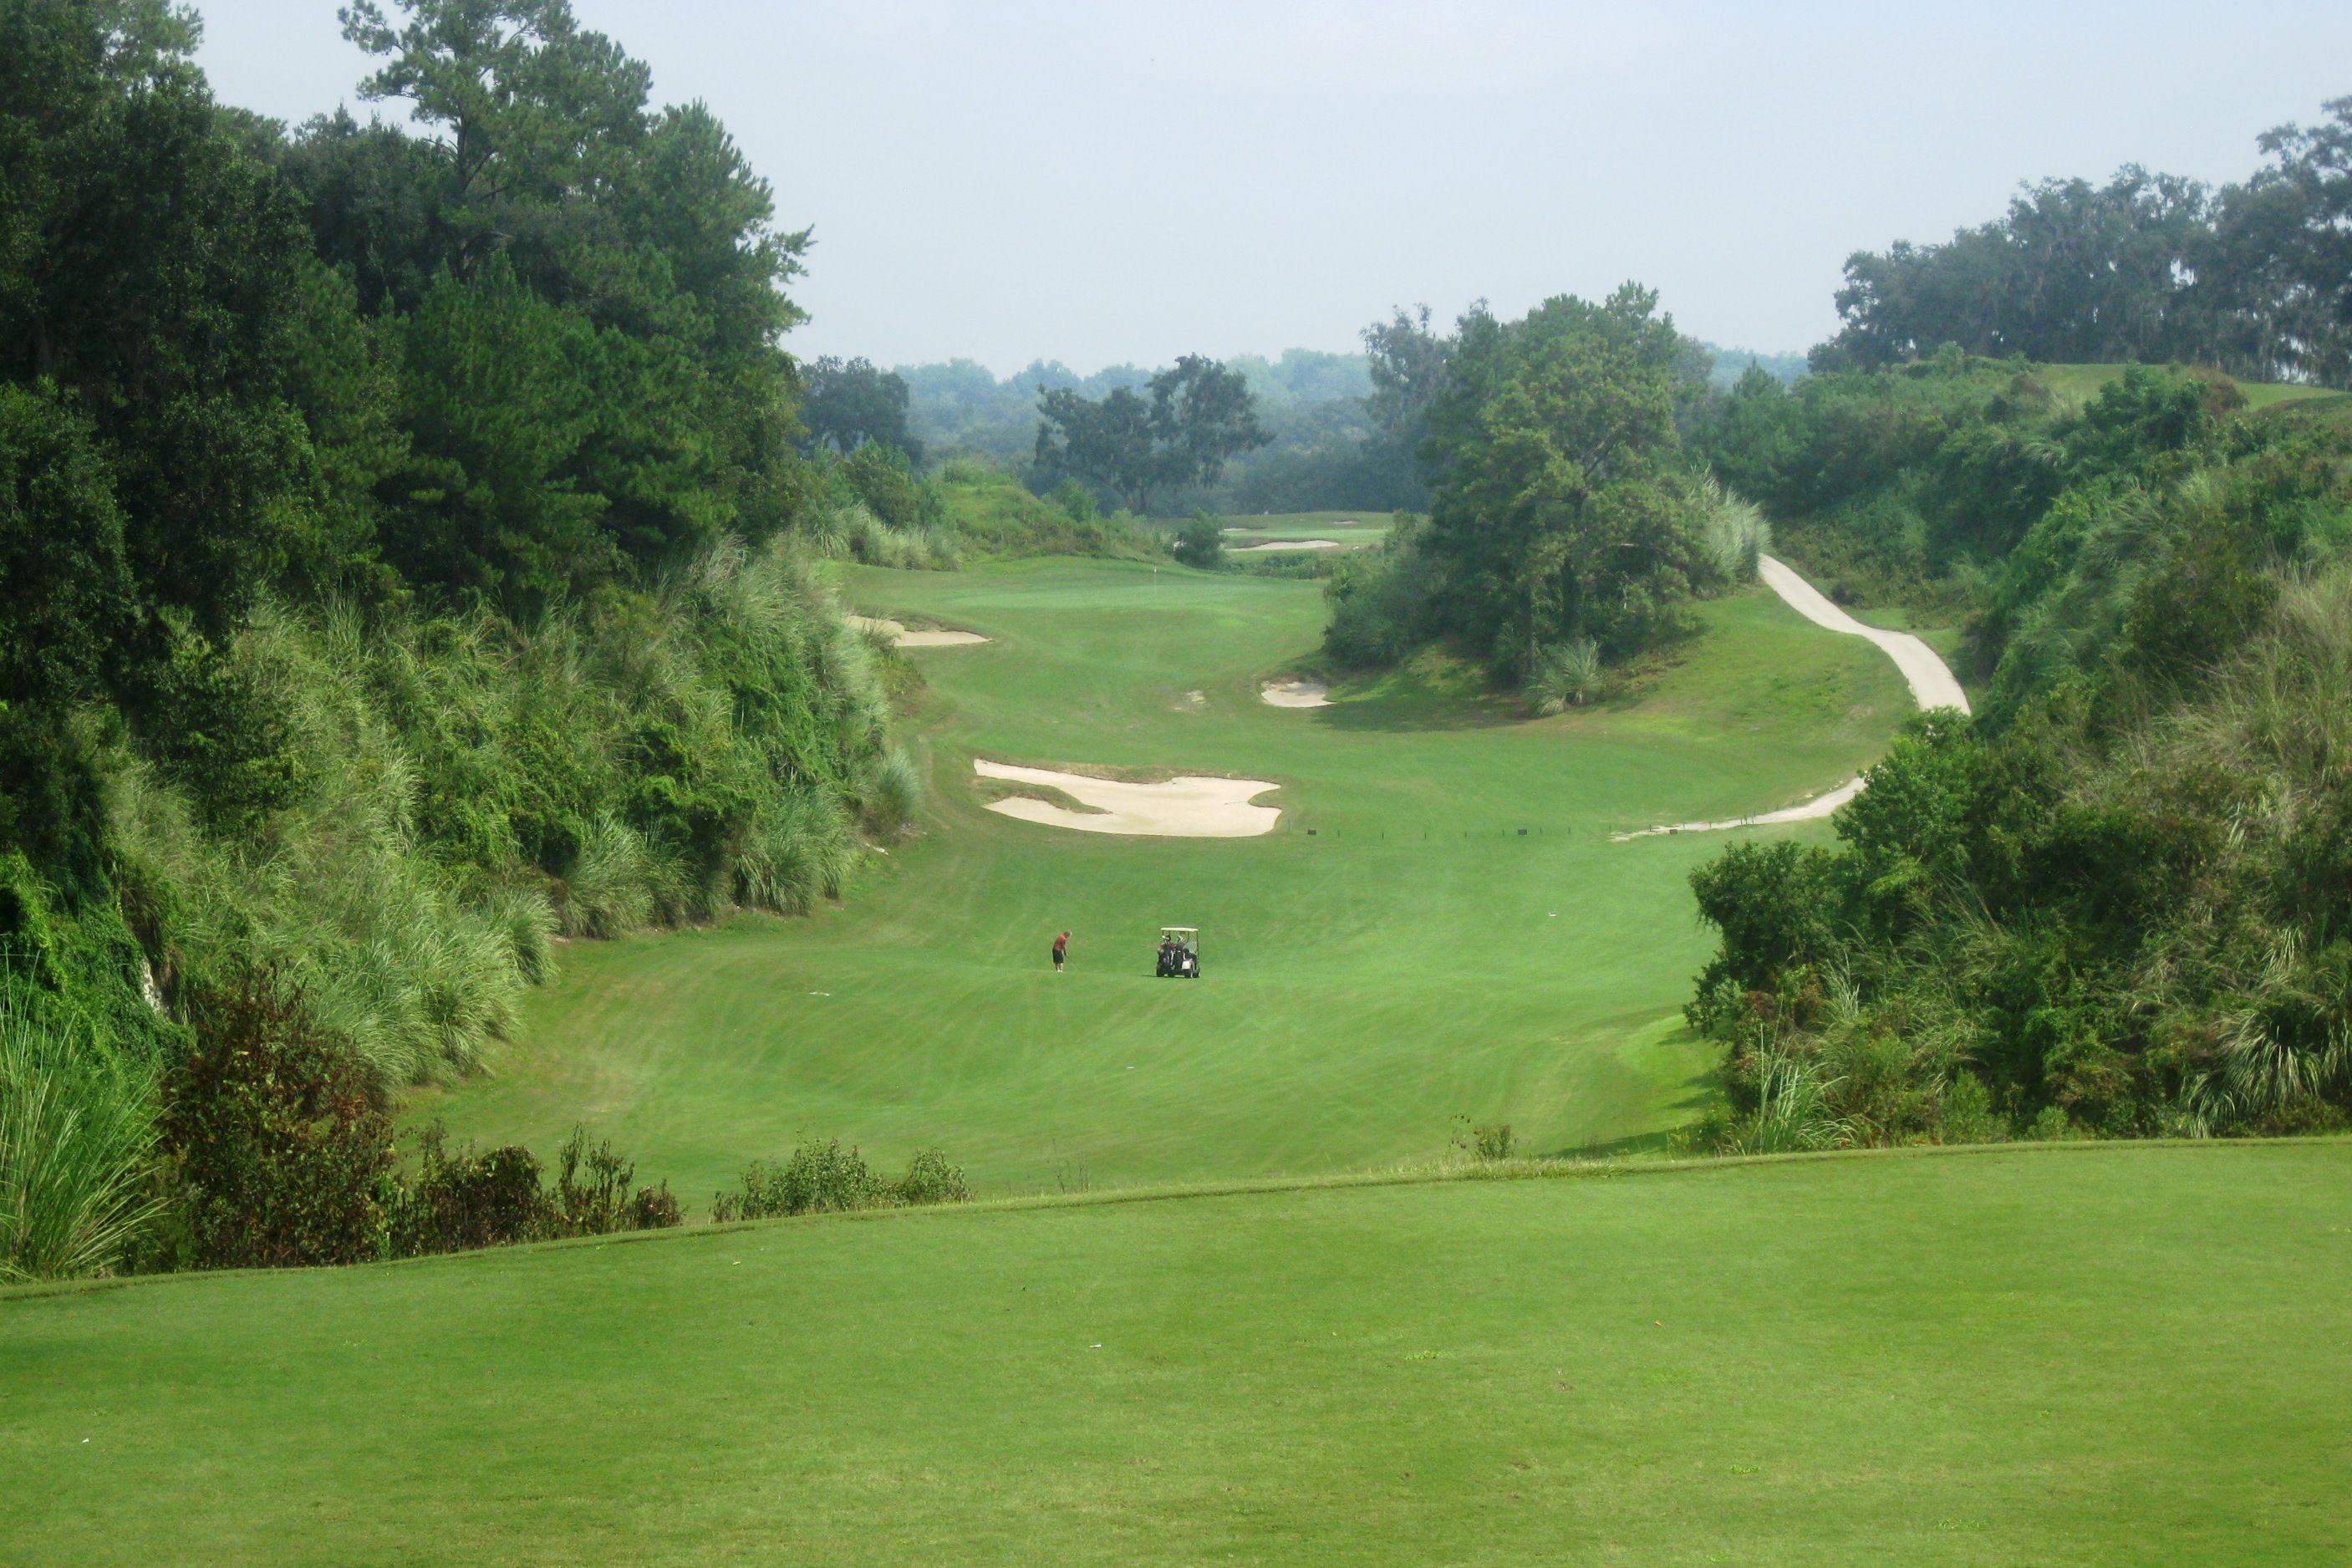 Brooksville quarry golf course cover picture